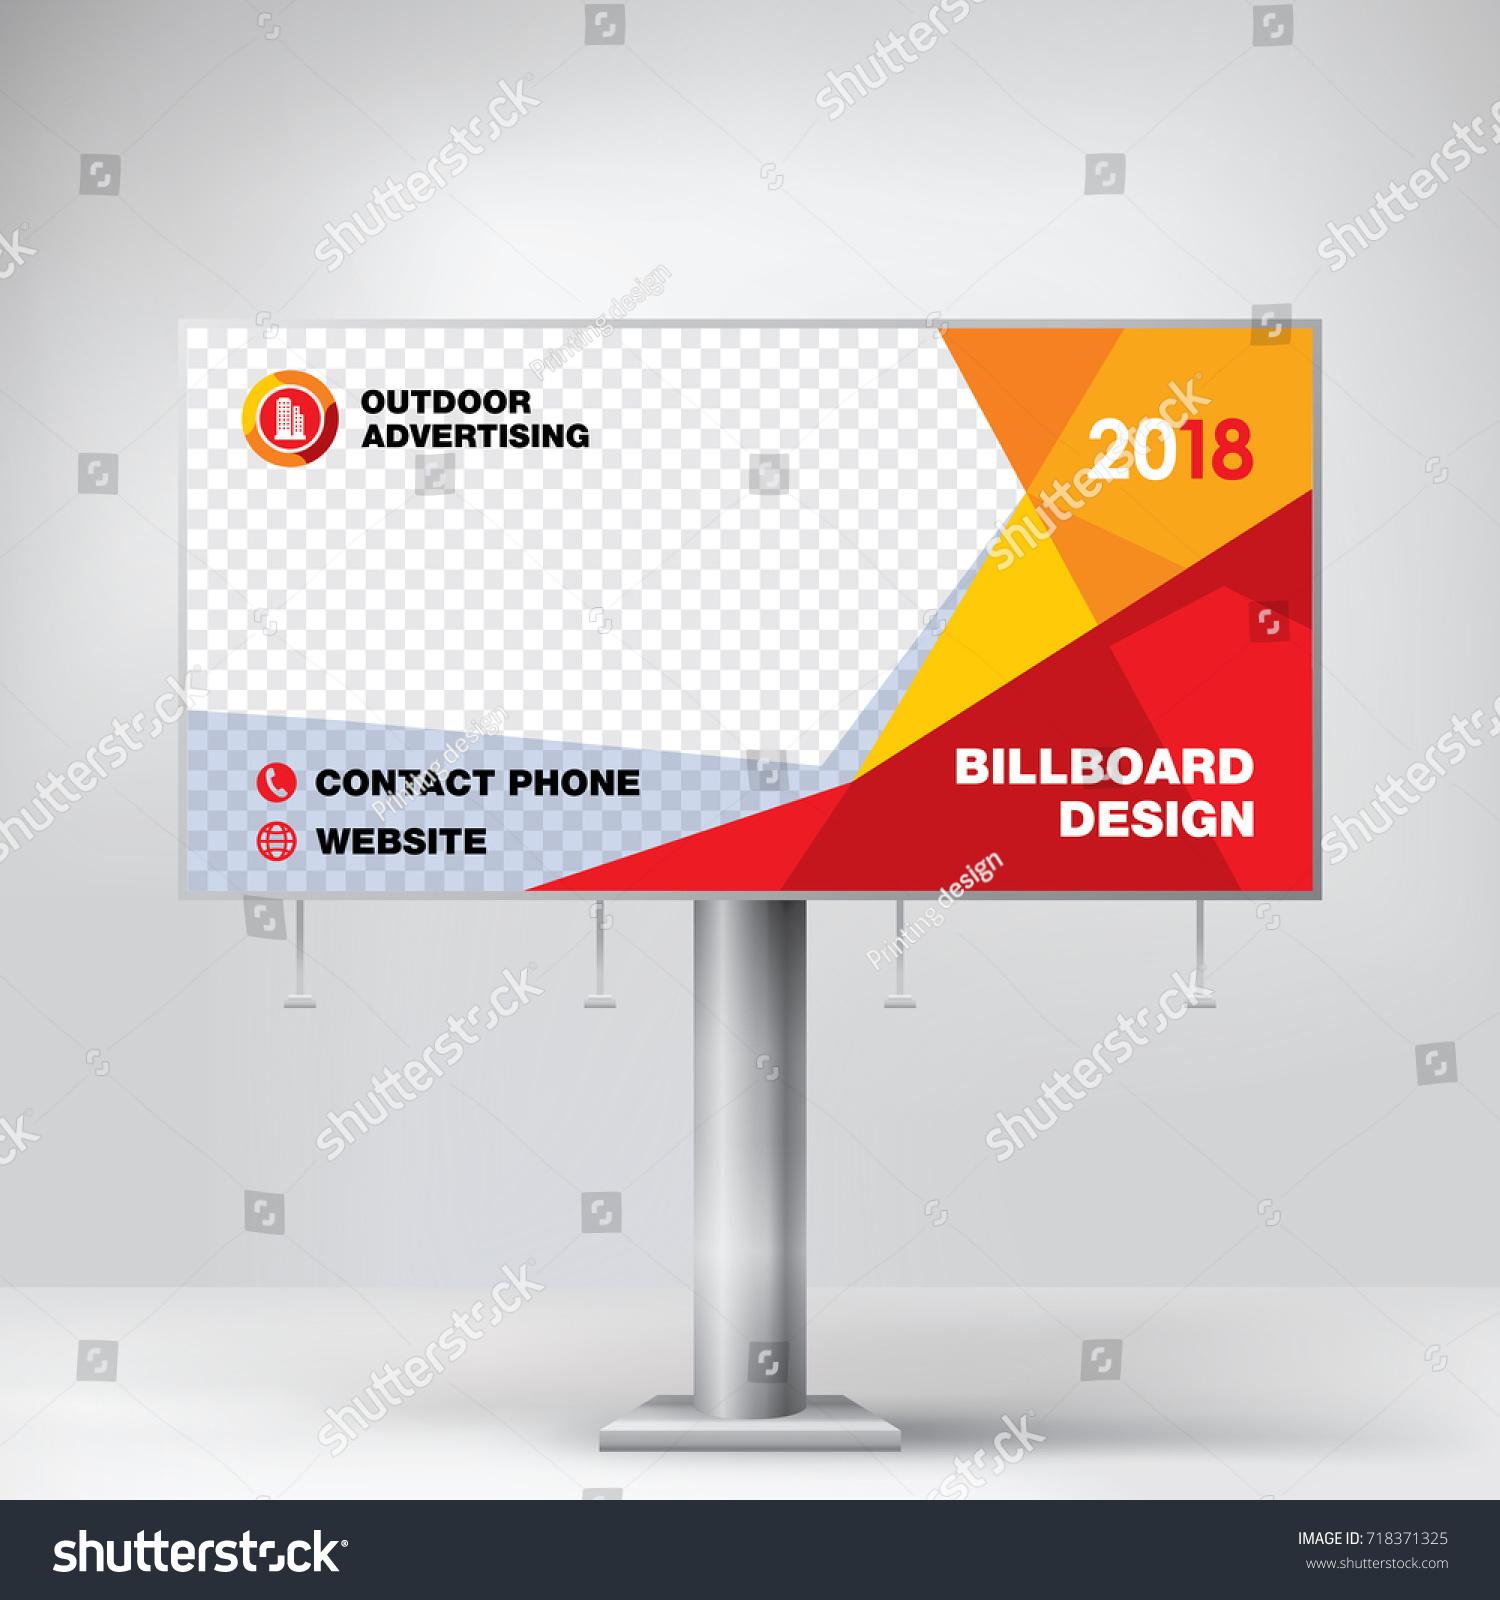 billboard design template